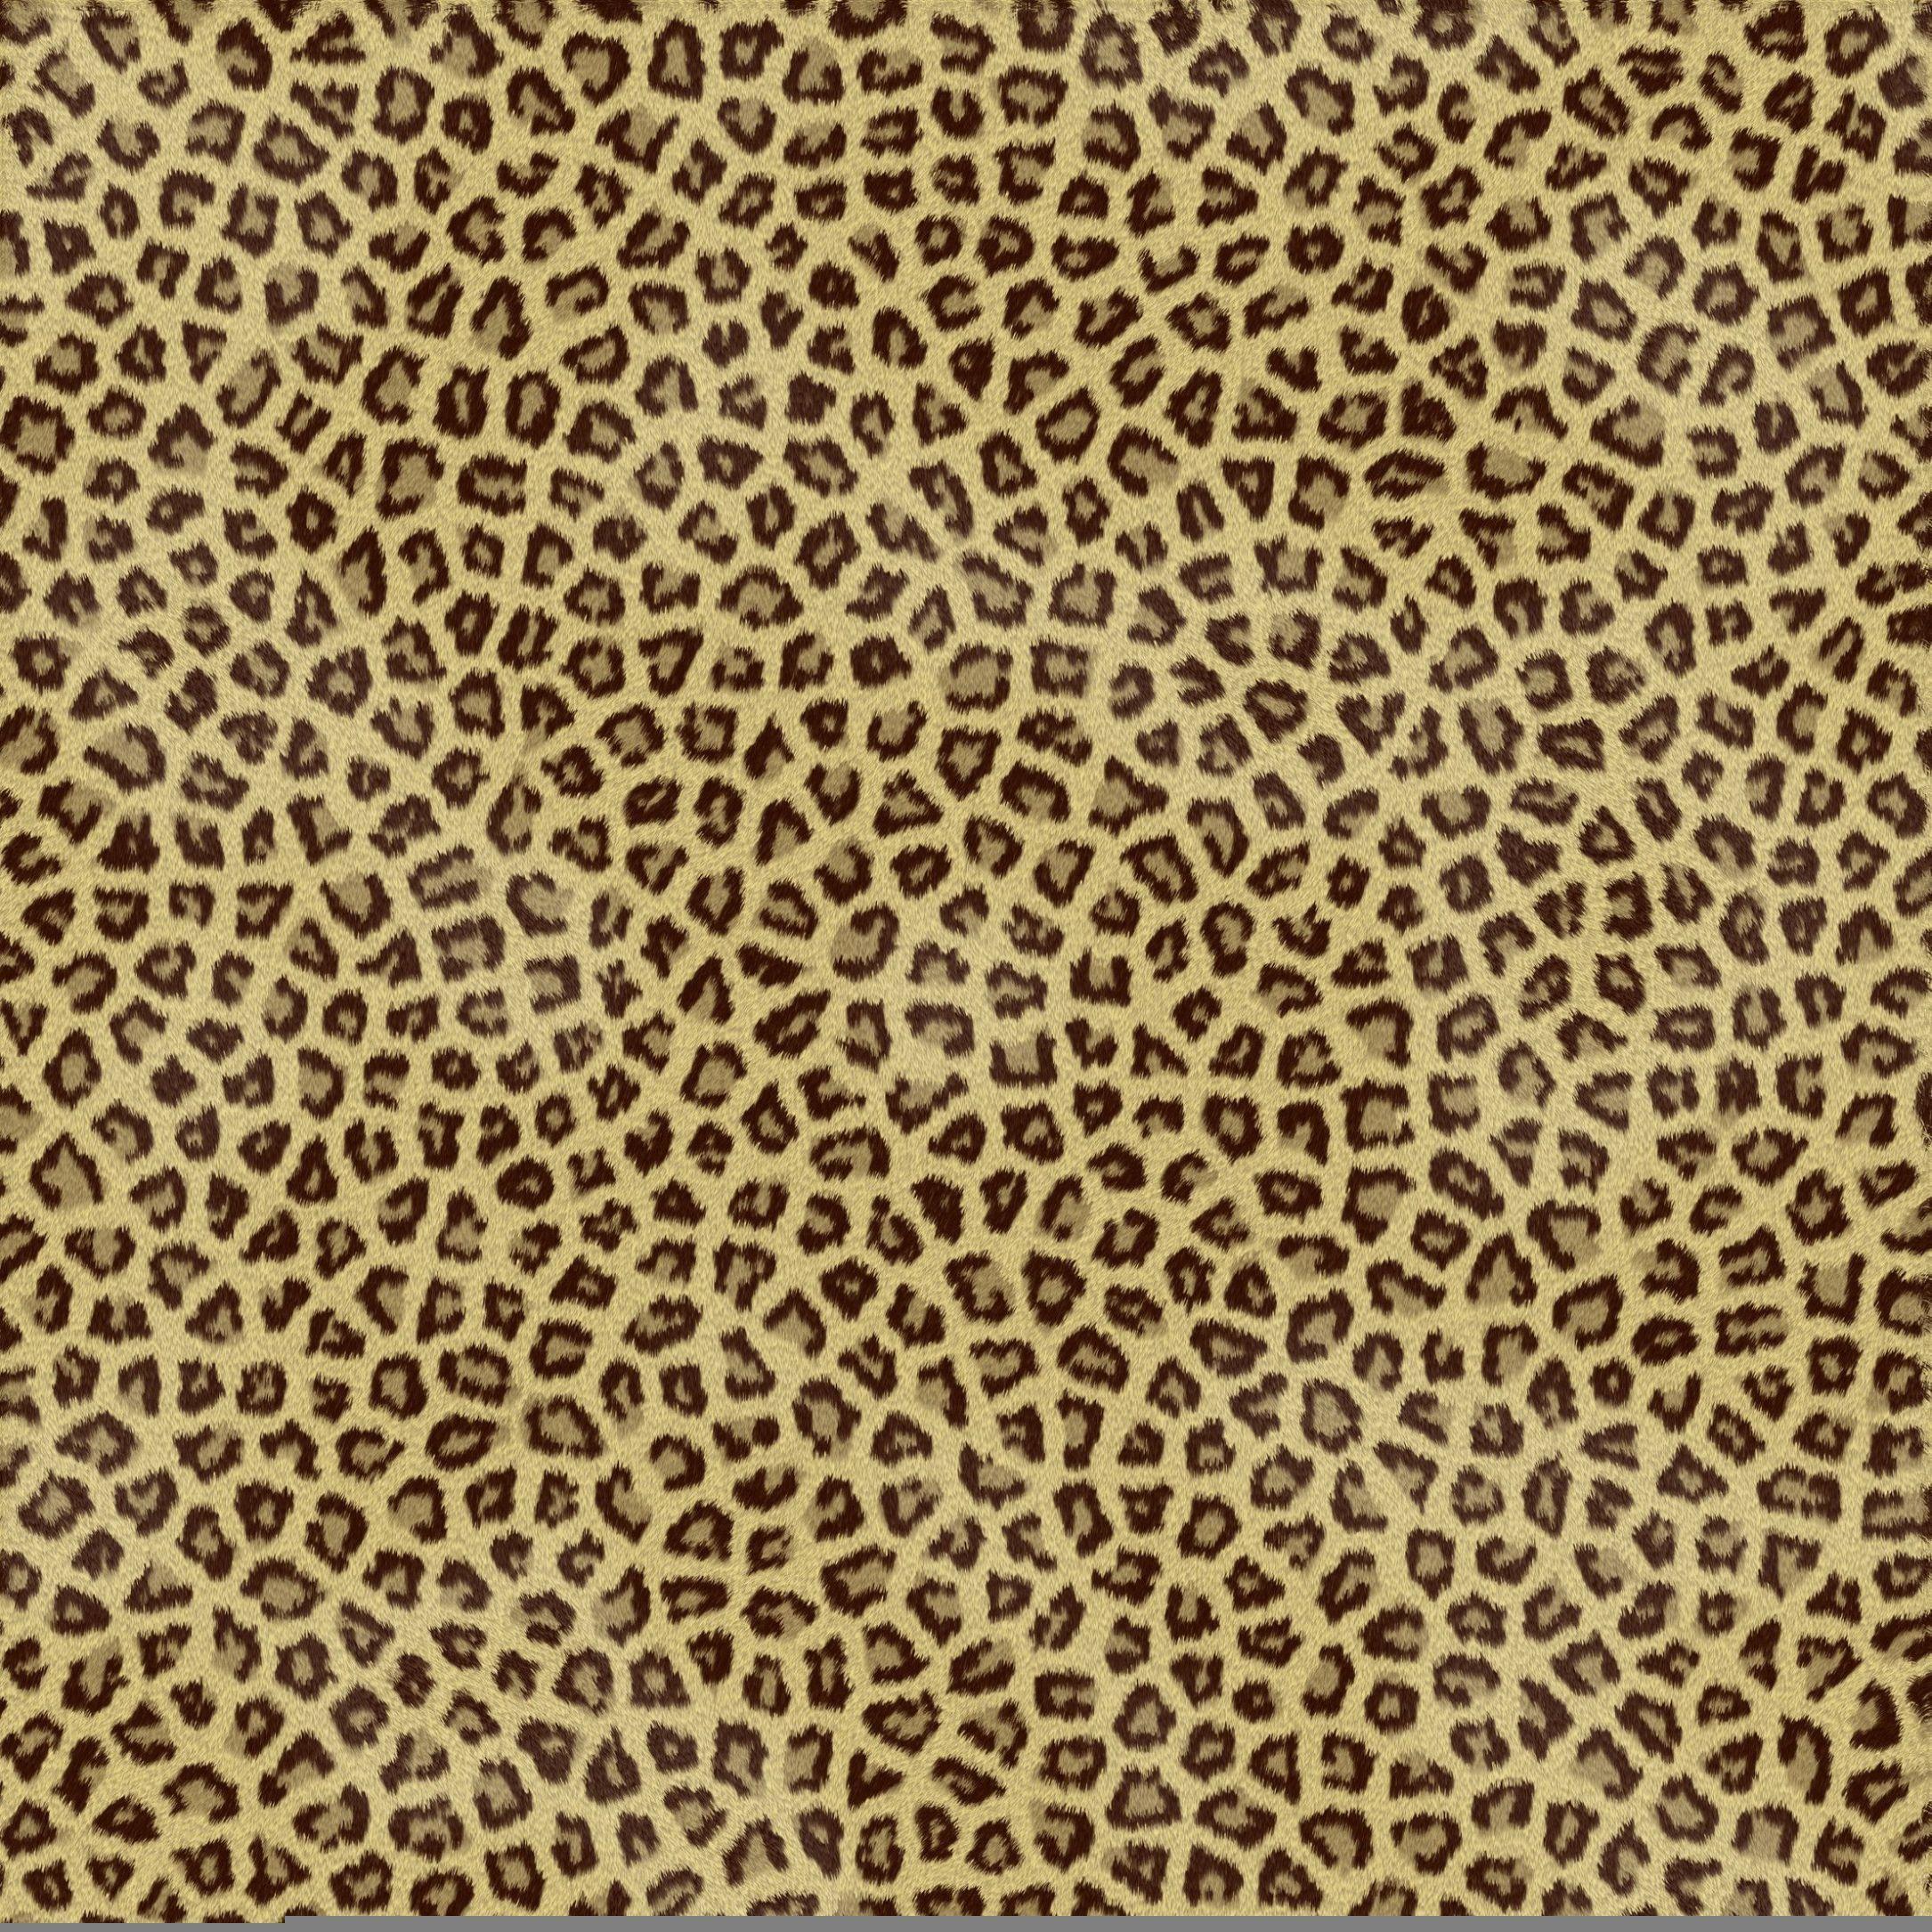 Animal Print Wallpapers - Top Free Animal Print Backgrounds ...